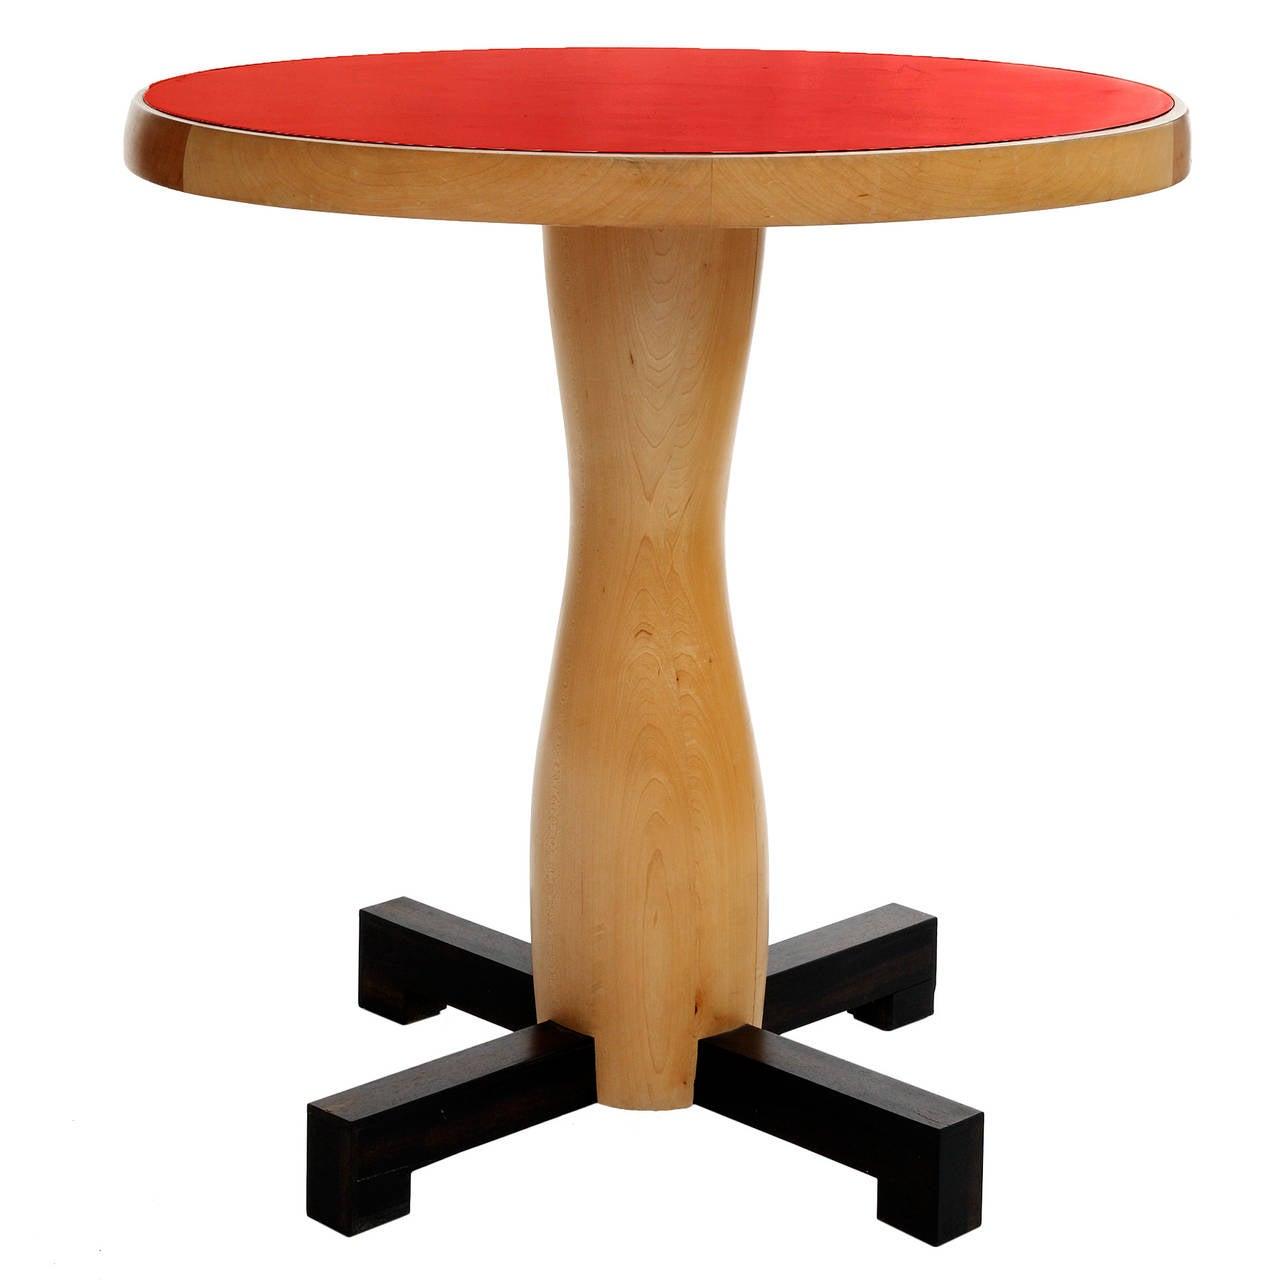 Unique Gueridon Round Table by Jacques Jarrige, 2006